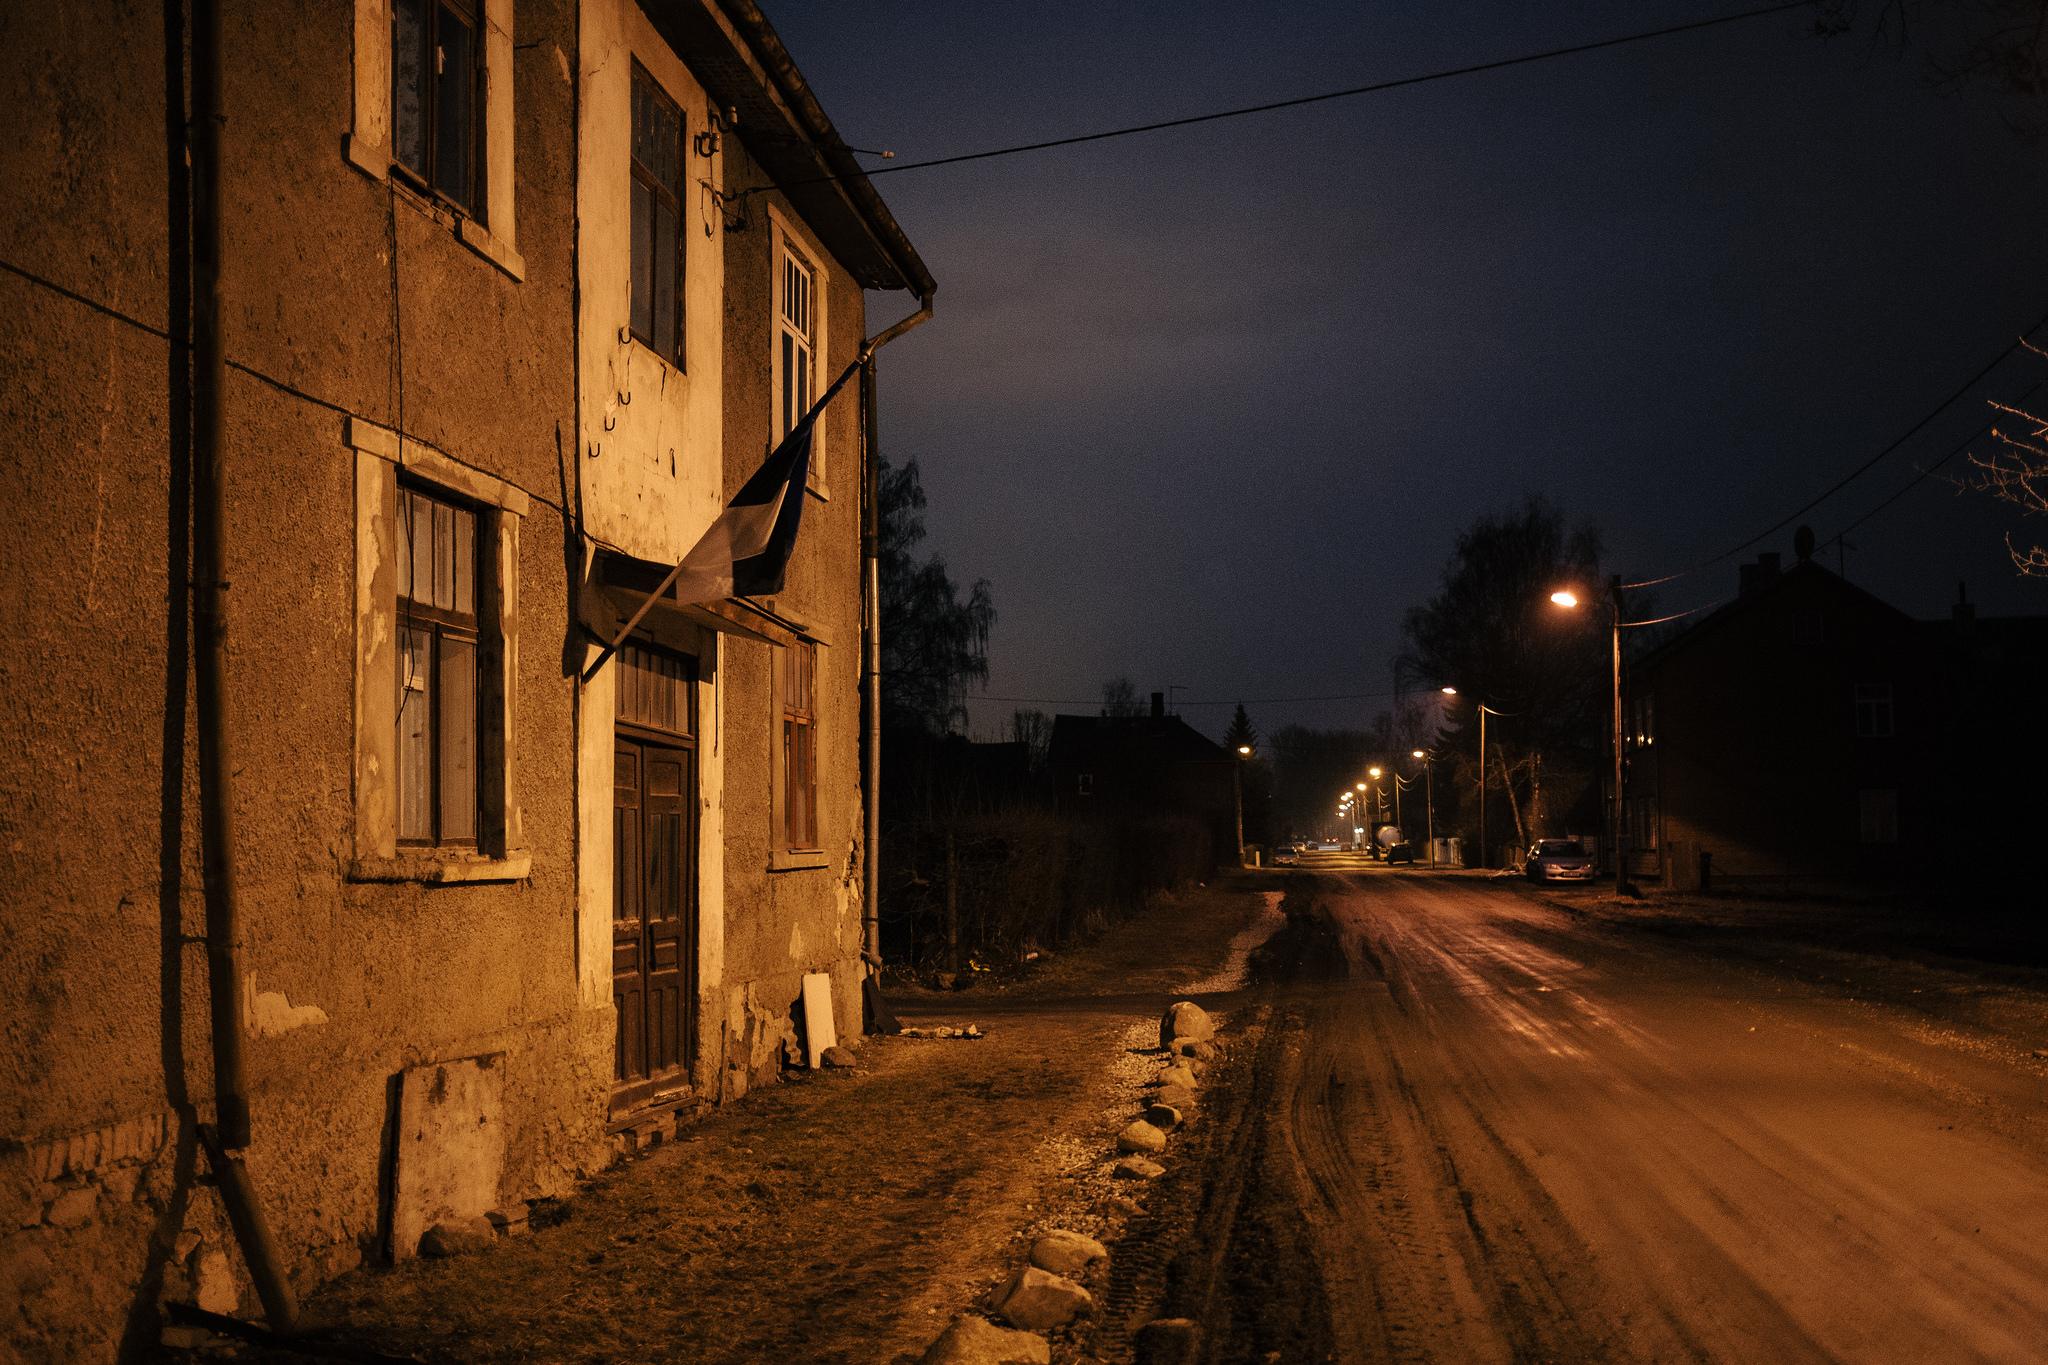 Ülejõe, Tartu, Estonia. March 2014.